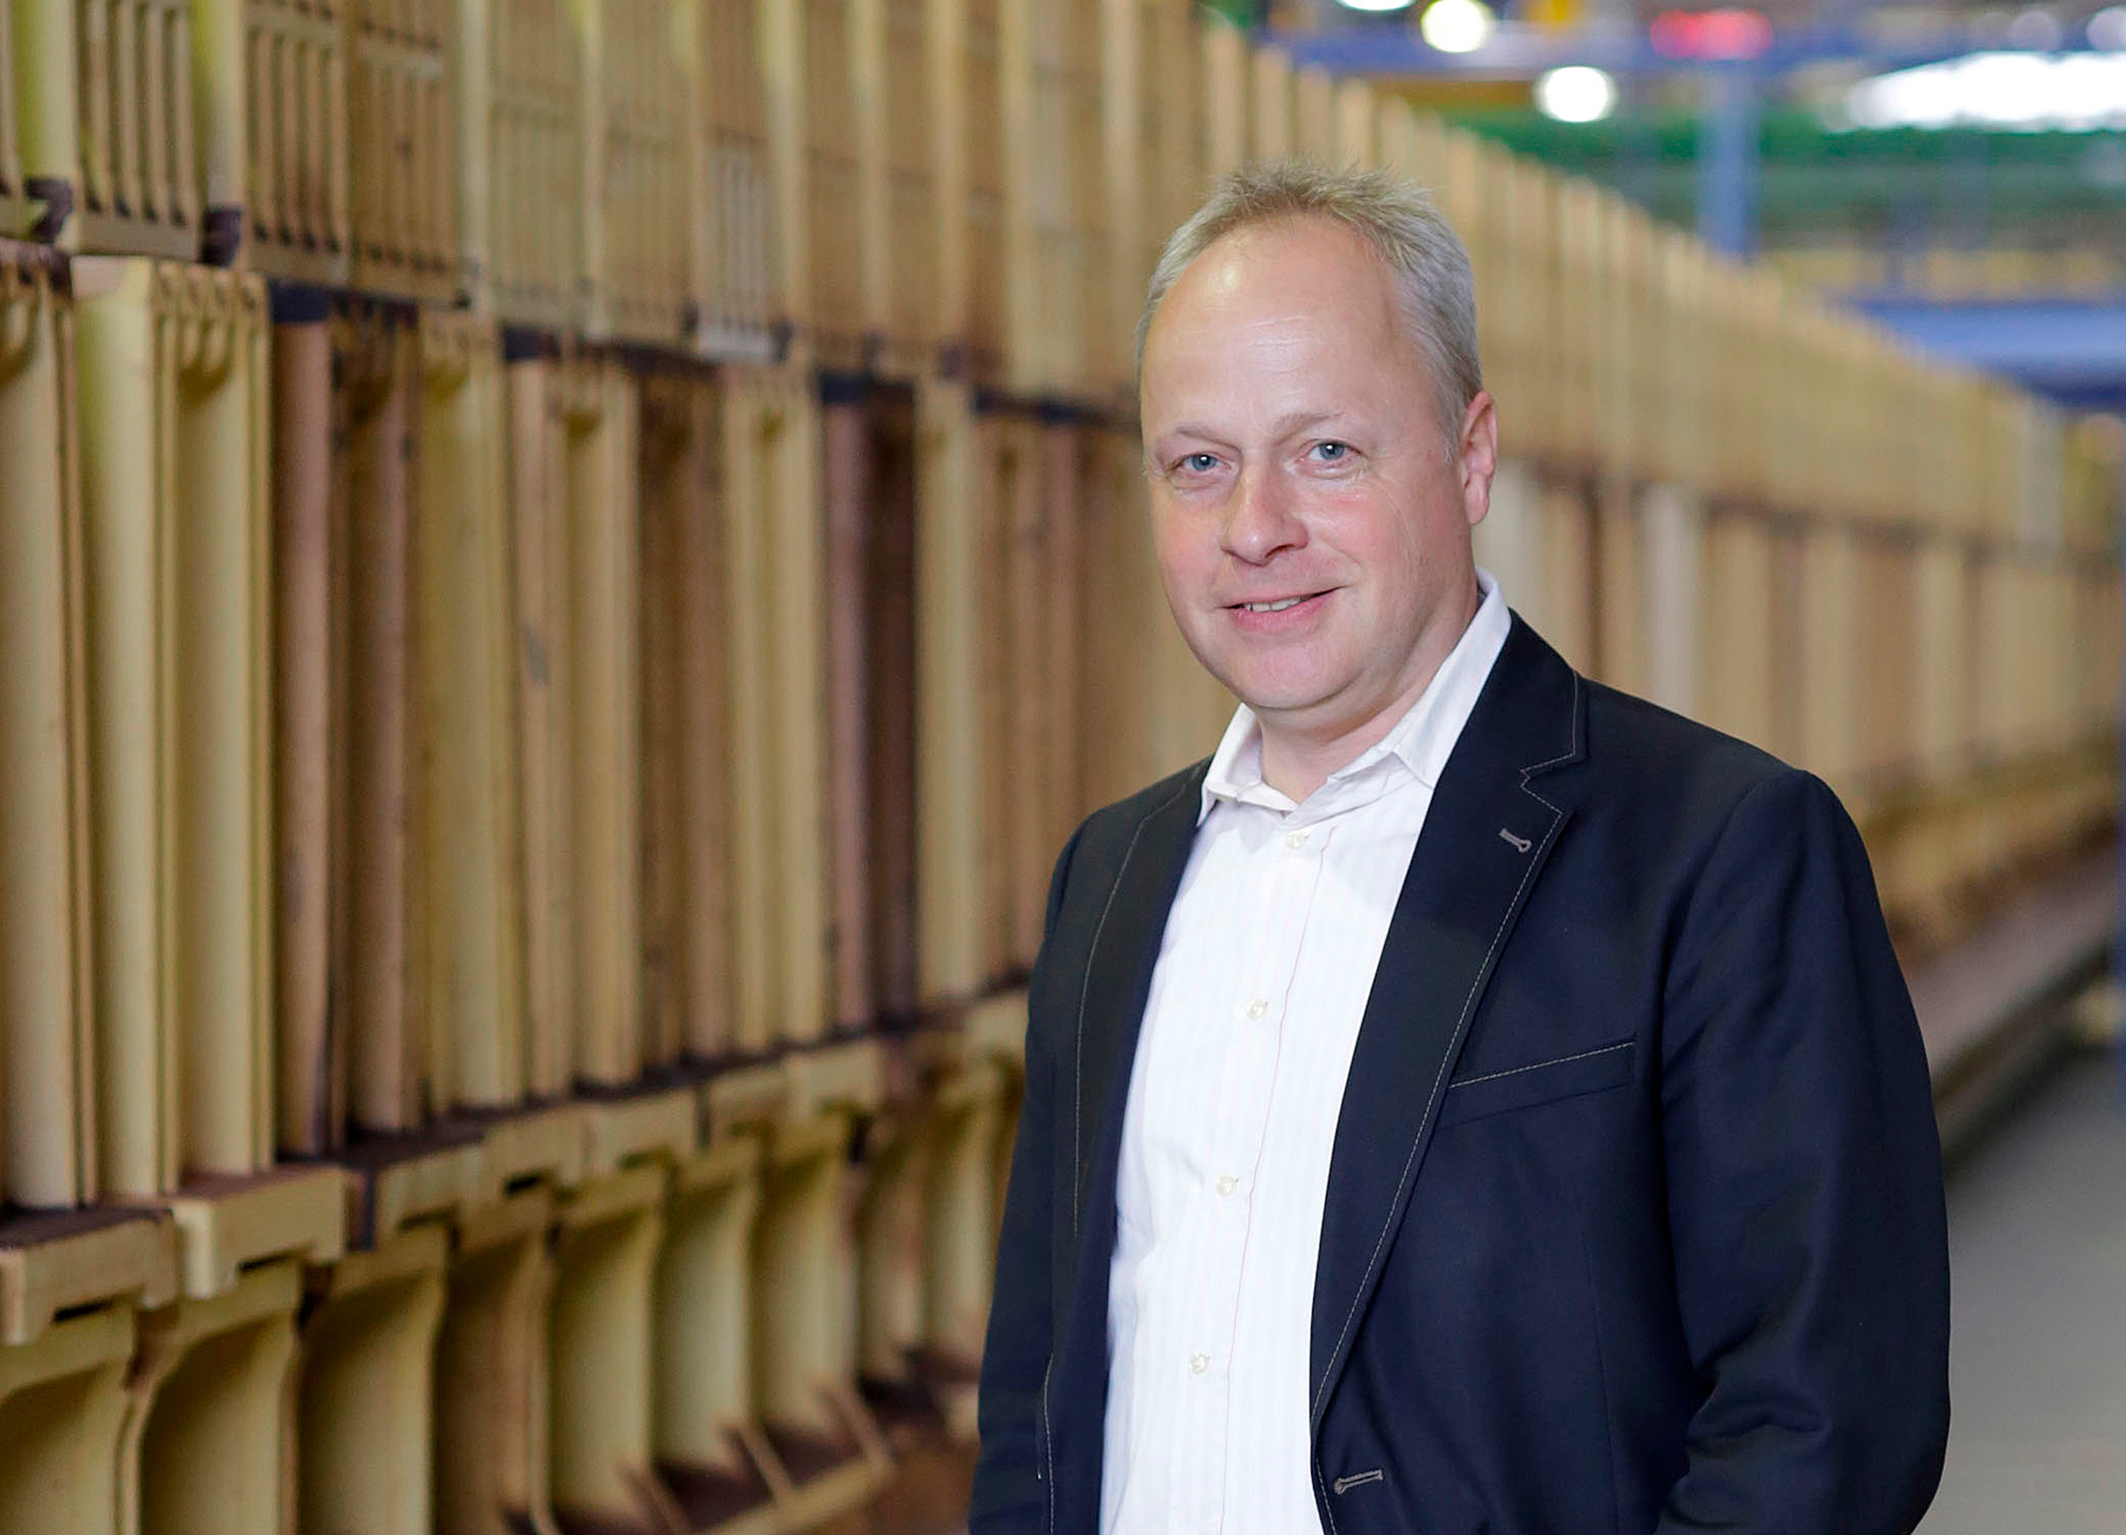 Gerald Laumans – Geschäftsführender Gesellschafter der Gebr. Laumans GmbH & Co. KG